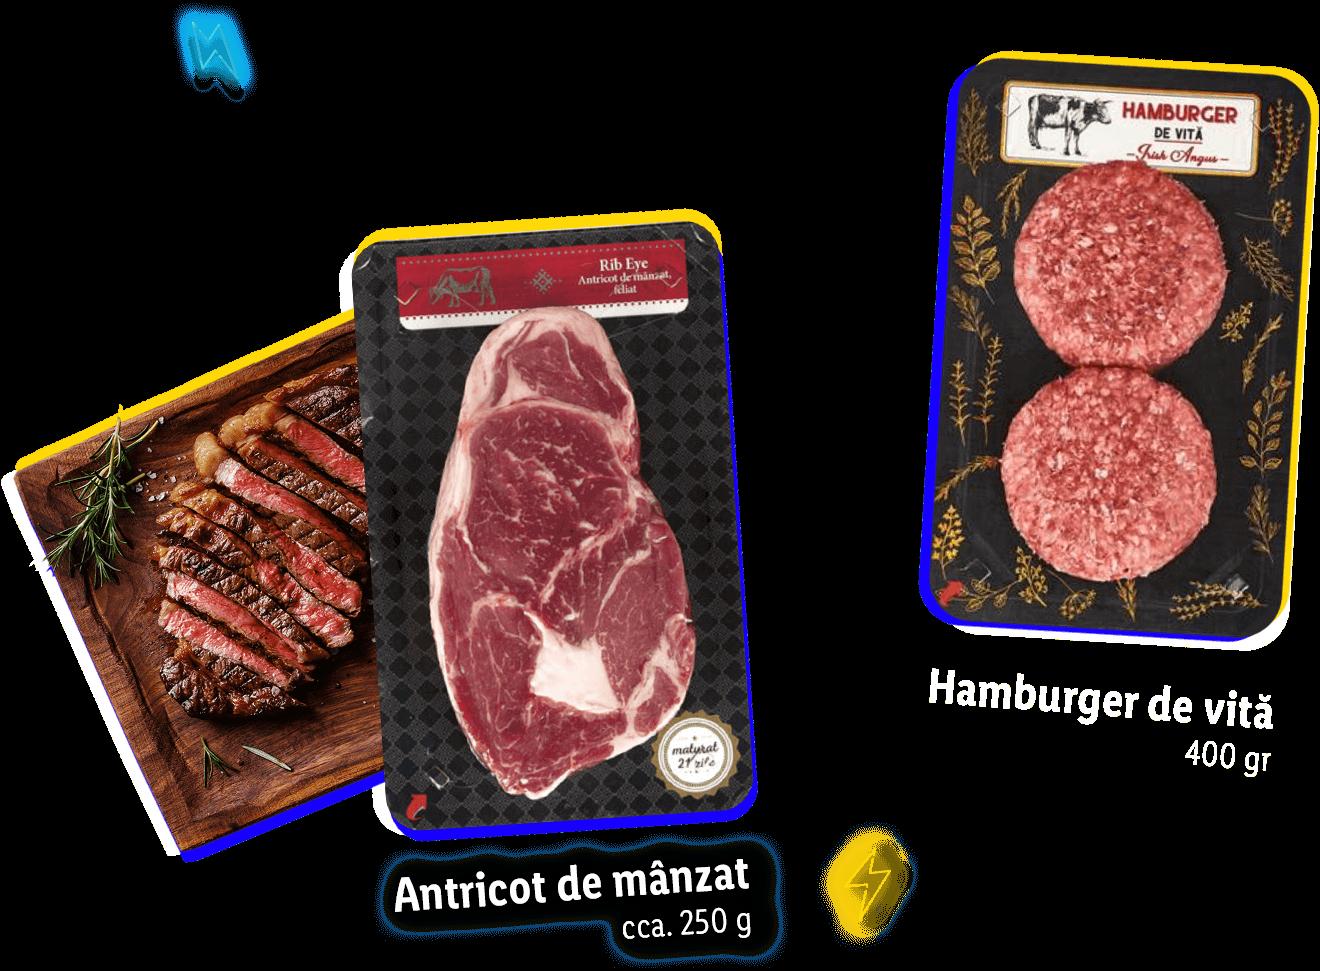 Antricot de mânzat cca. 250g, Hamburger de vită 400gr